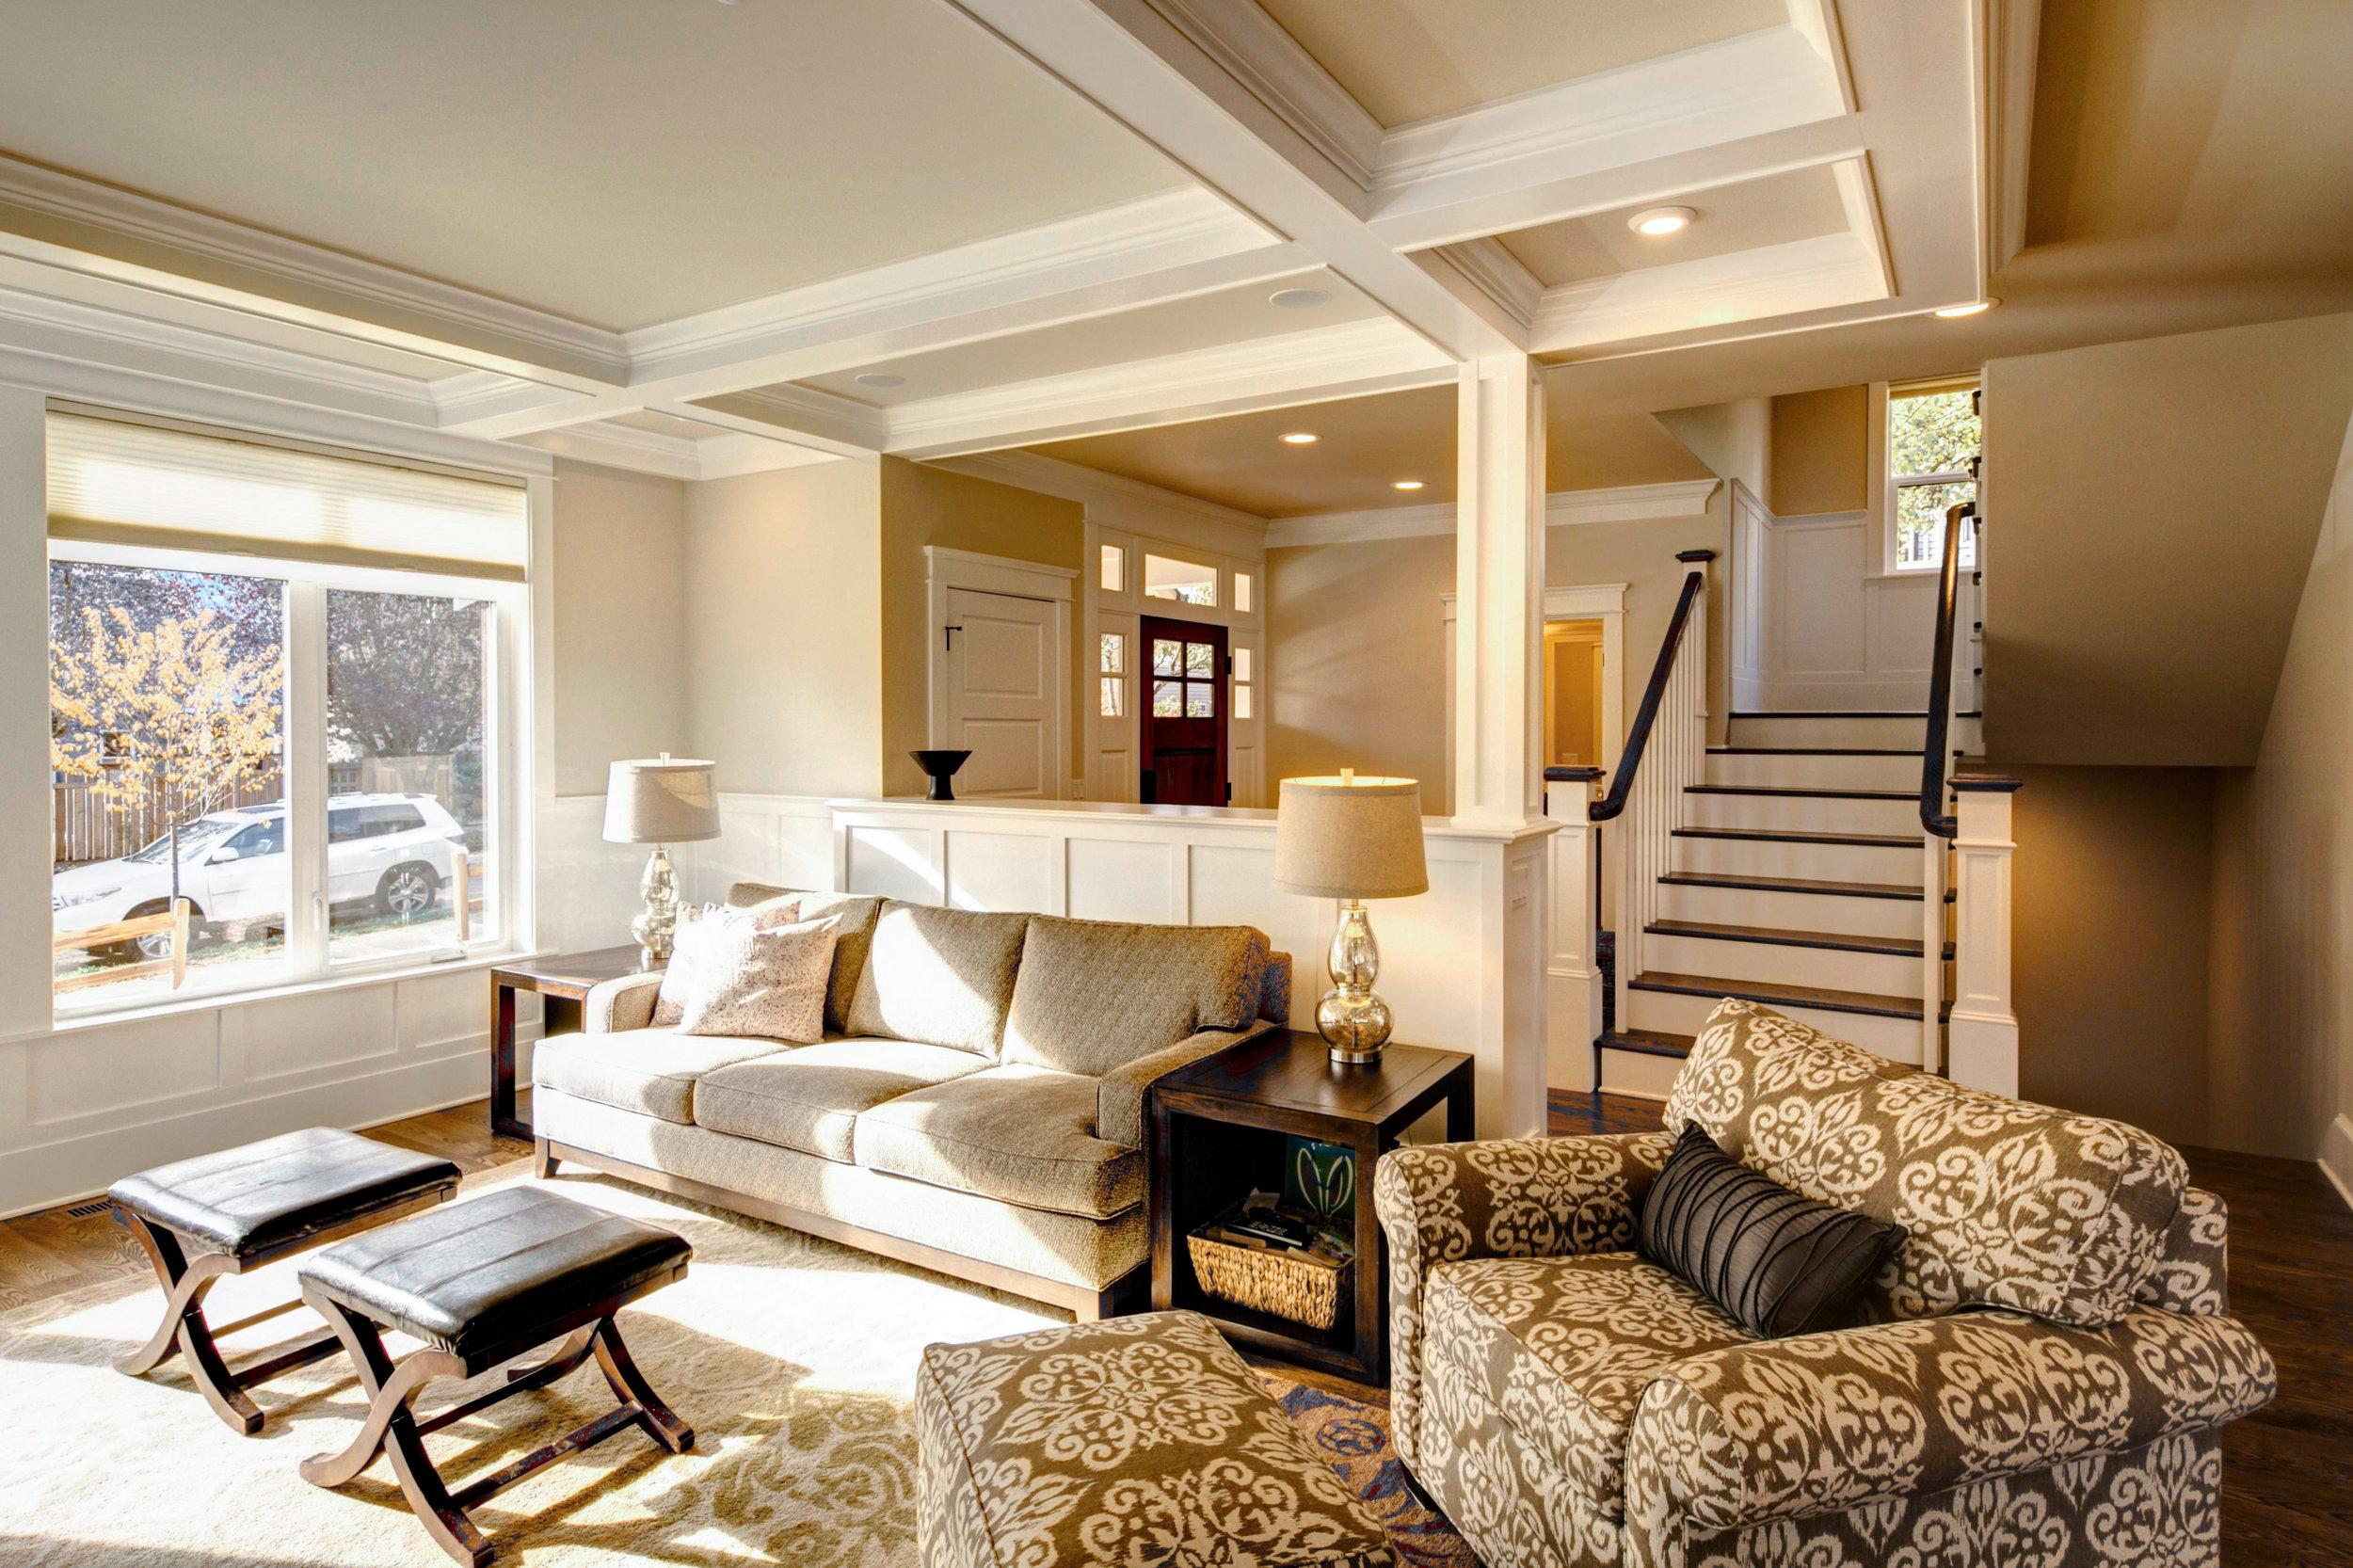 mandy callaway interiors-greenlake house-00005.jpg